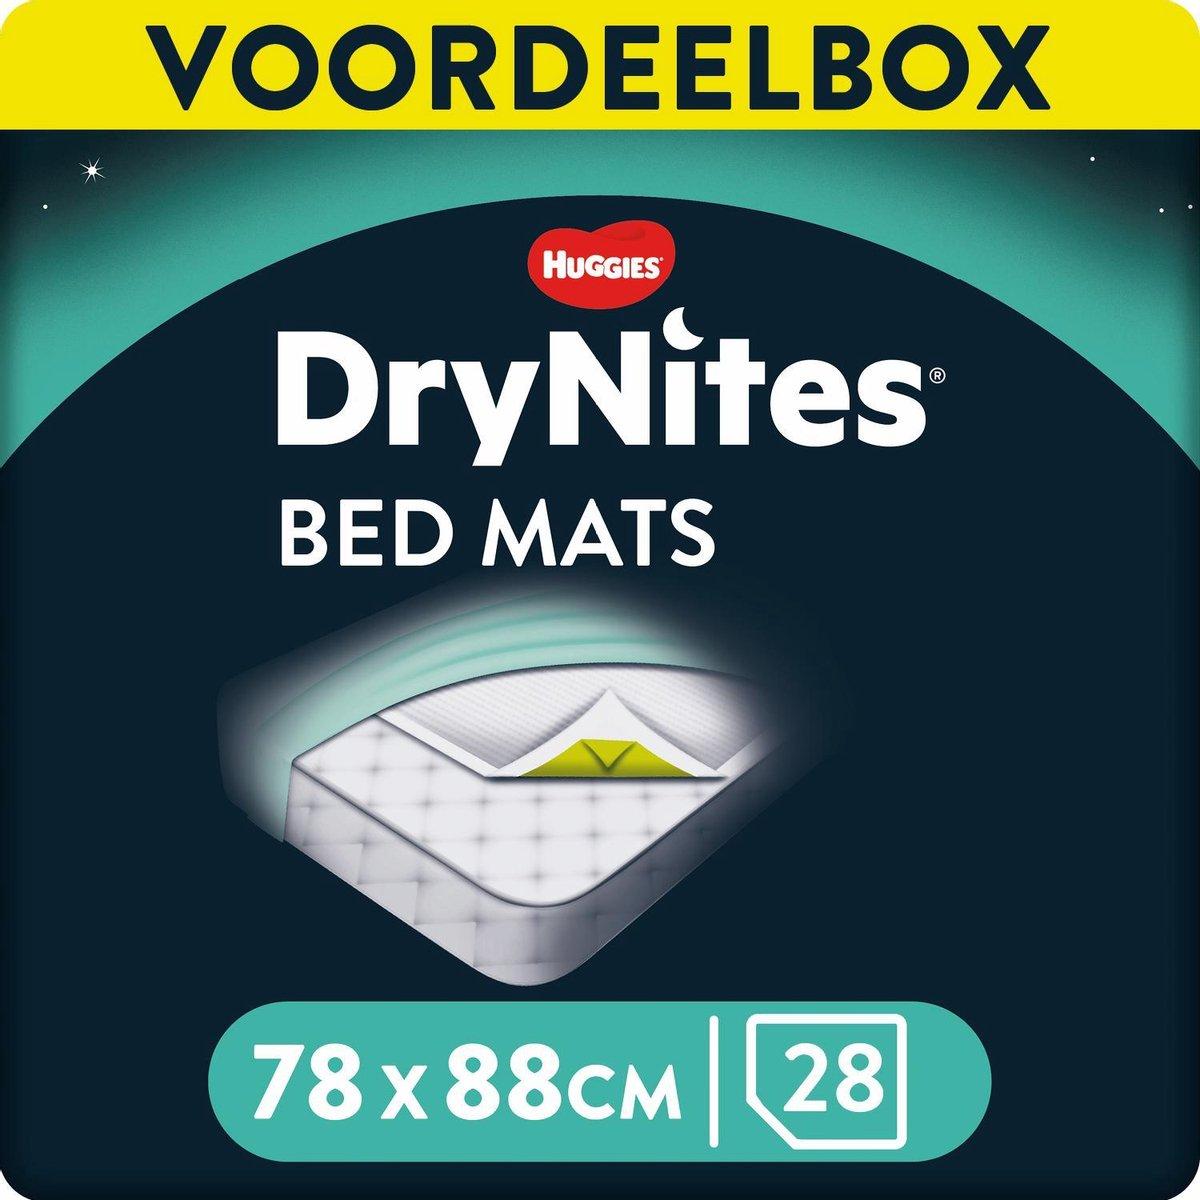 DryNites Matrasbeschermers - Extra Absorberend - 88 x 78 cm - 28 stuks